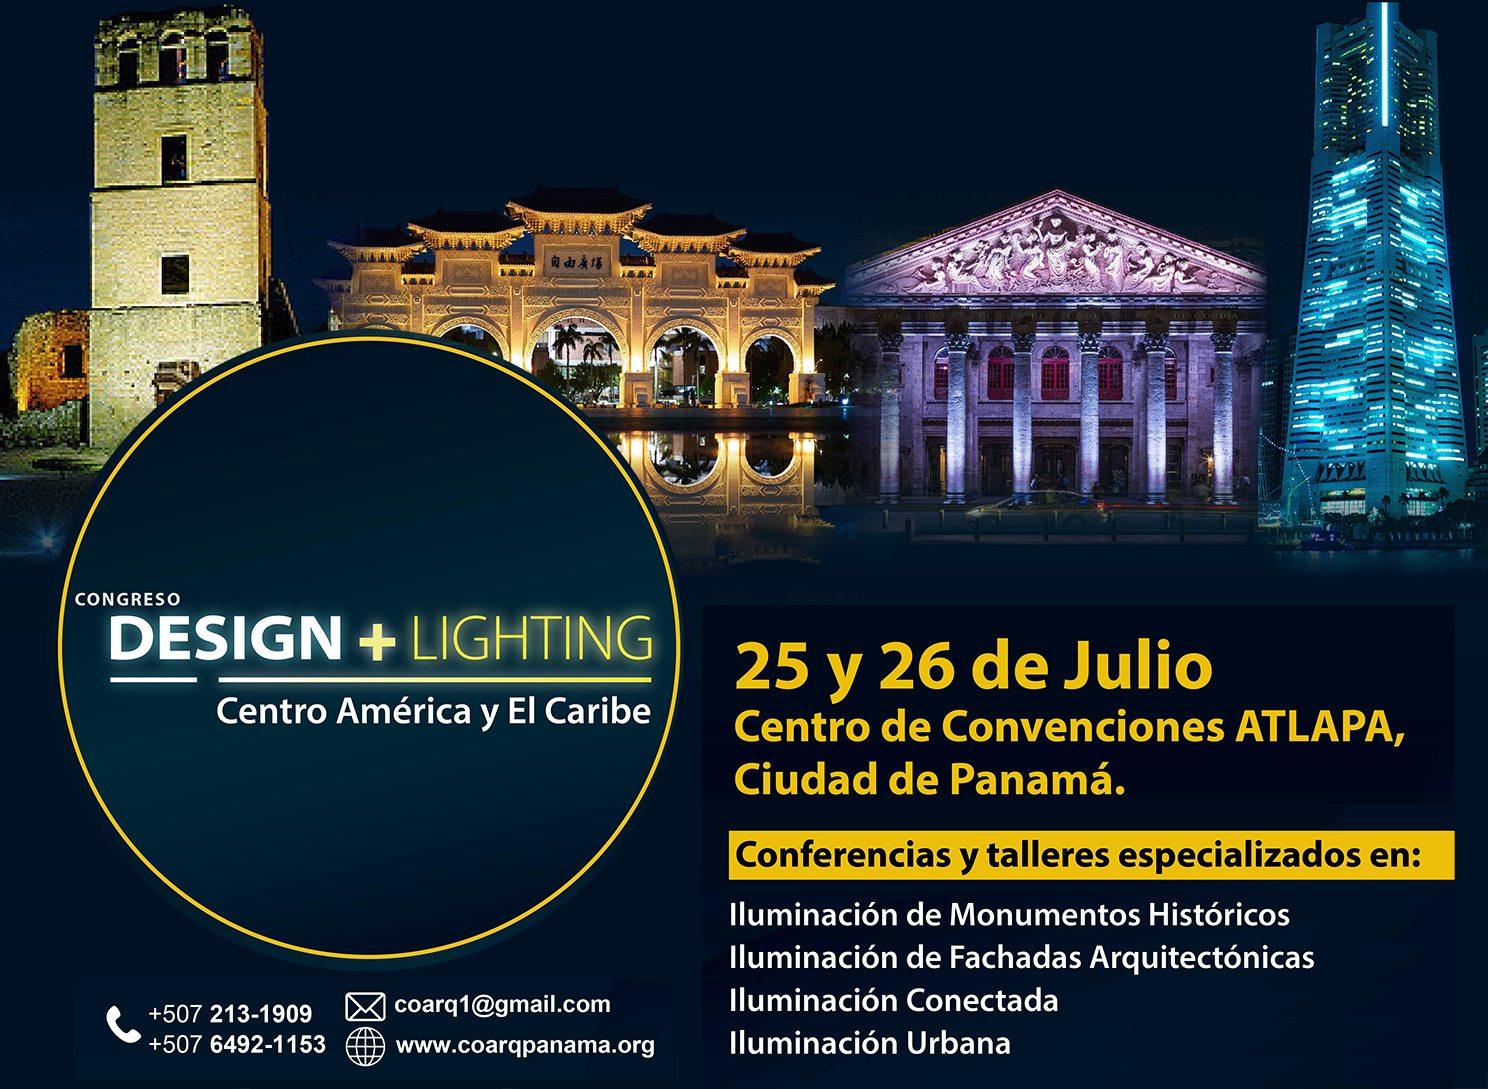 portada-DesignLighting-home-anfalum